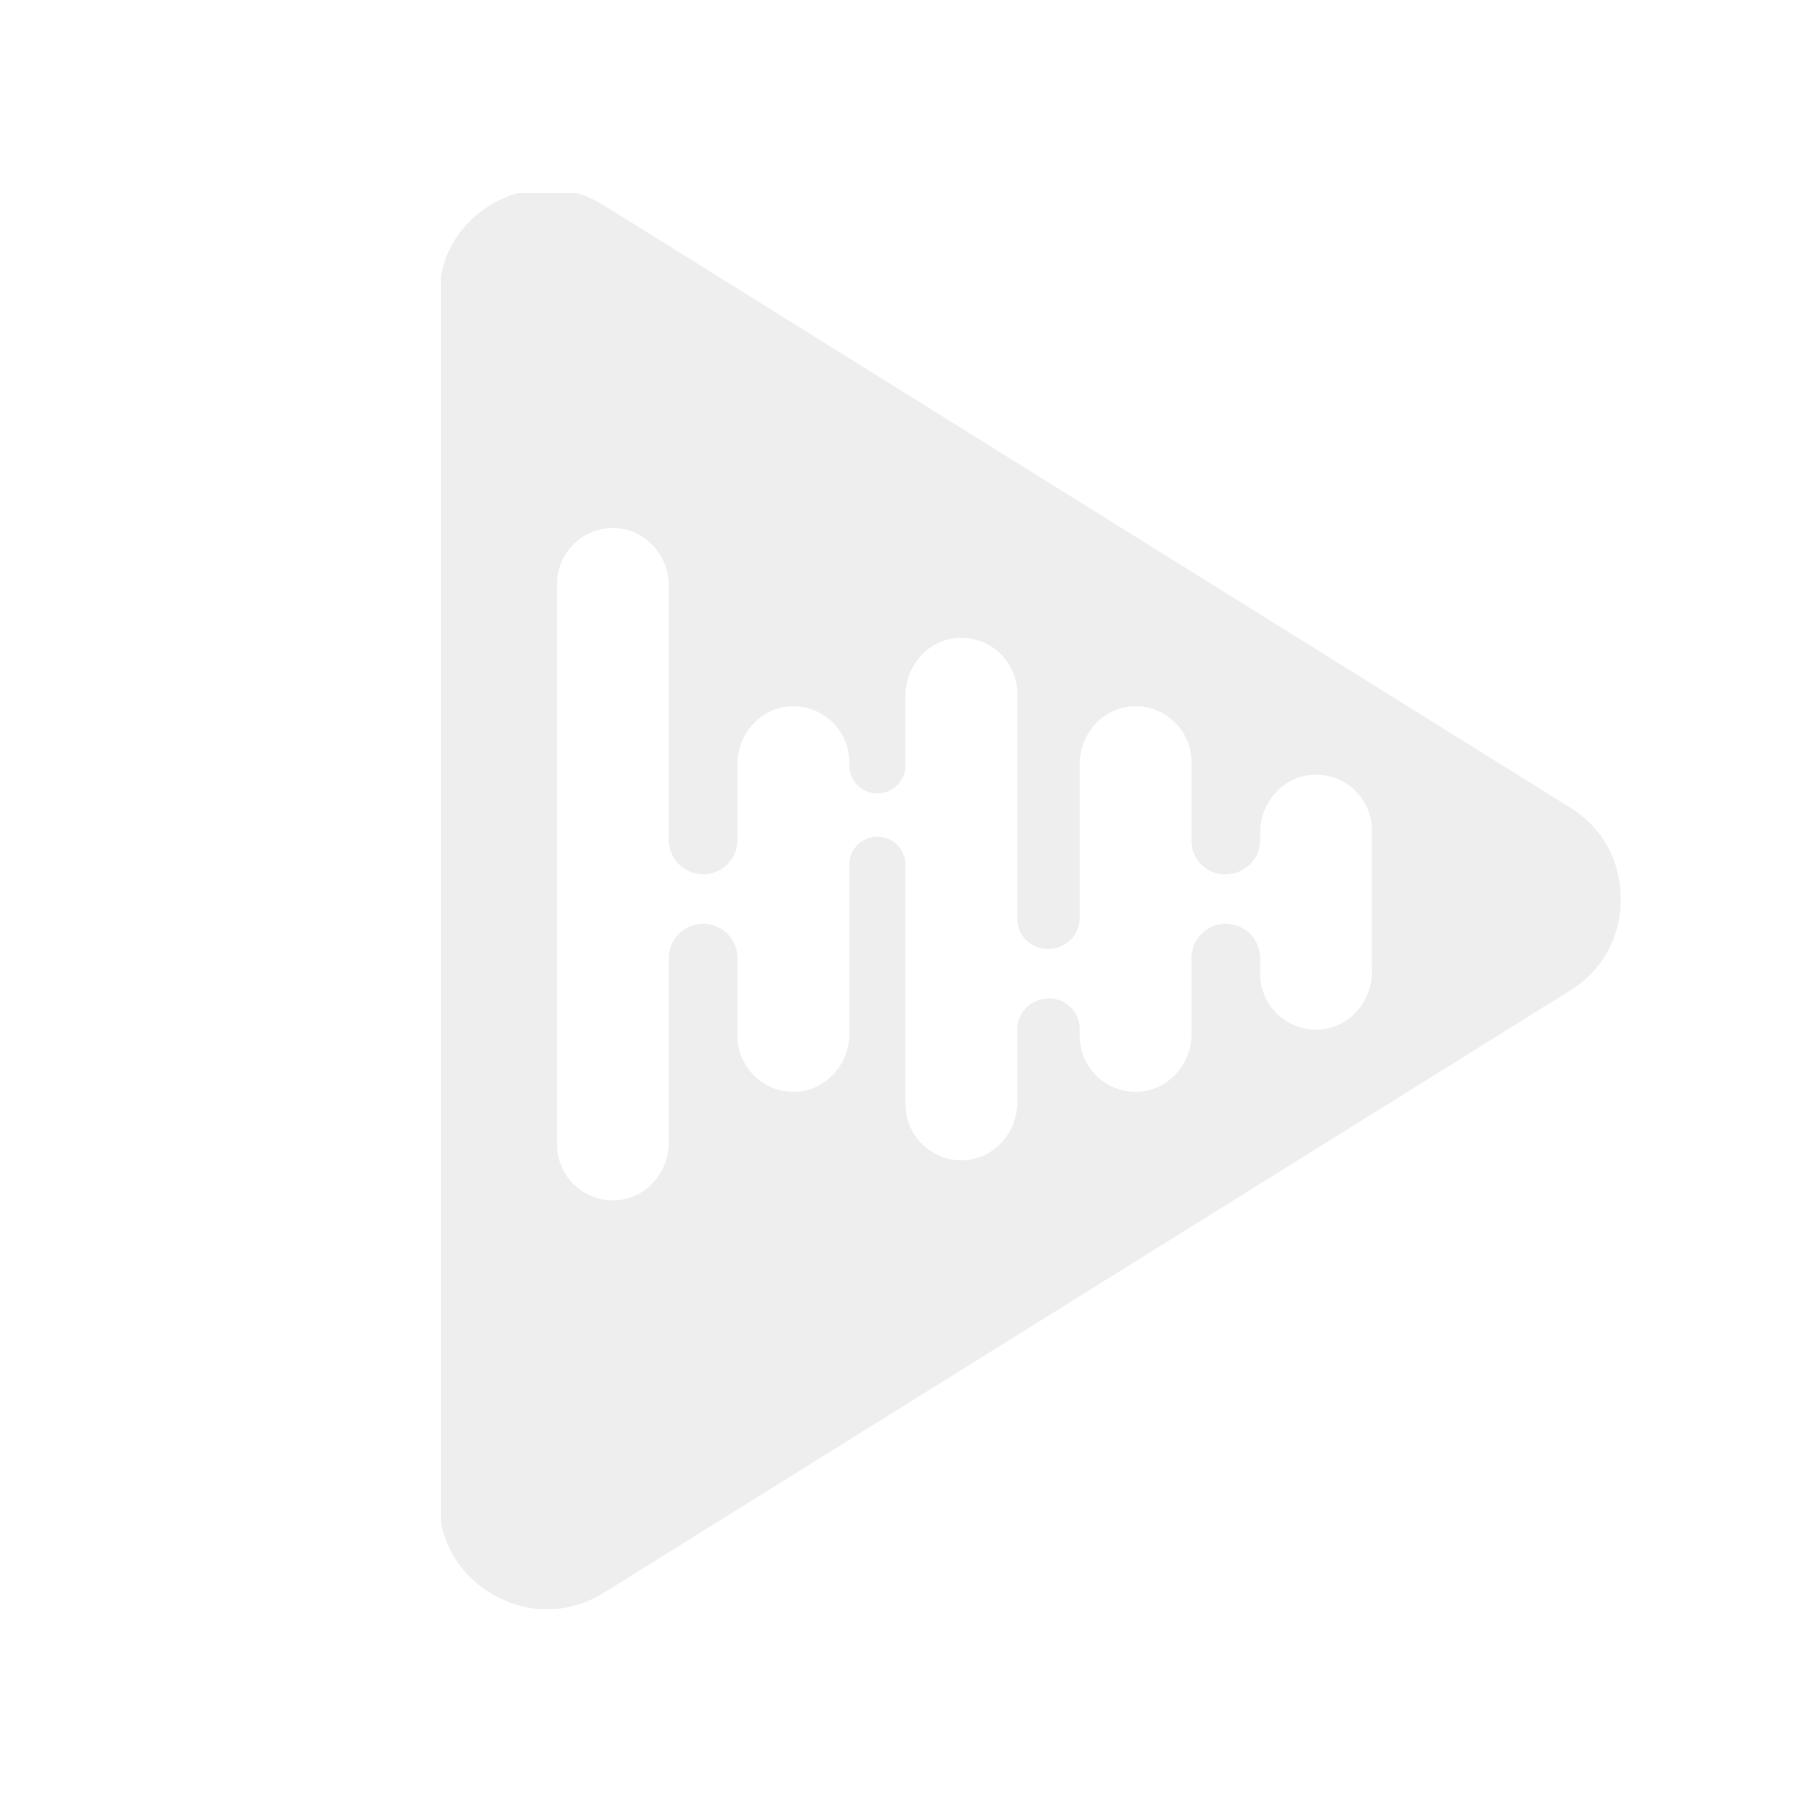 Metra AXADGM04 - Kabelsett til AXADBOX1/2 - Chevrolet Malibu ('13 >)